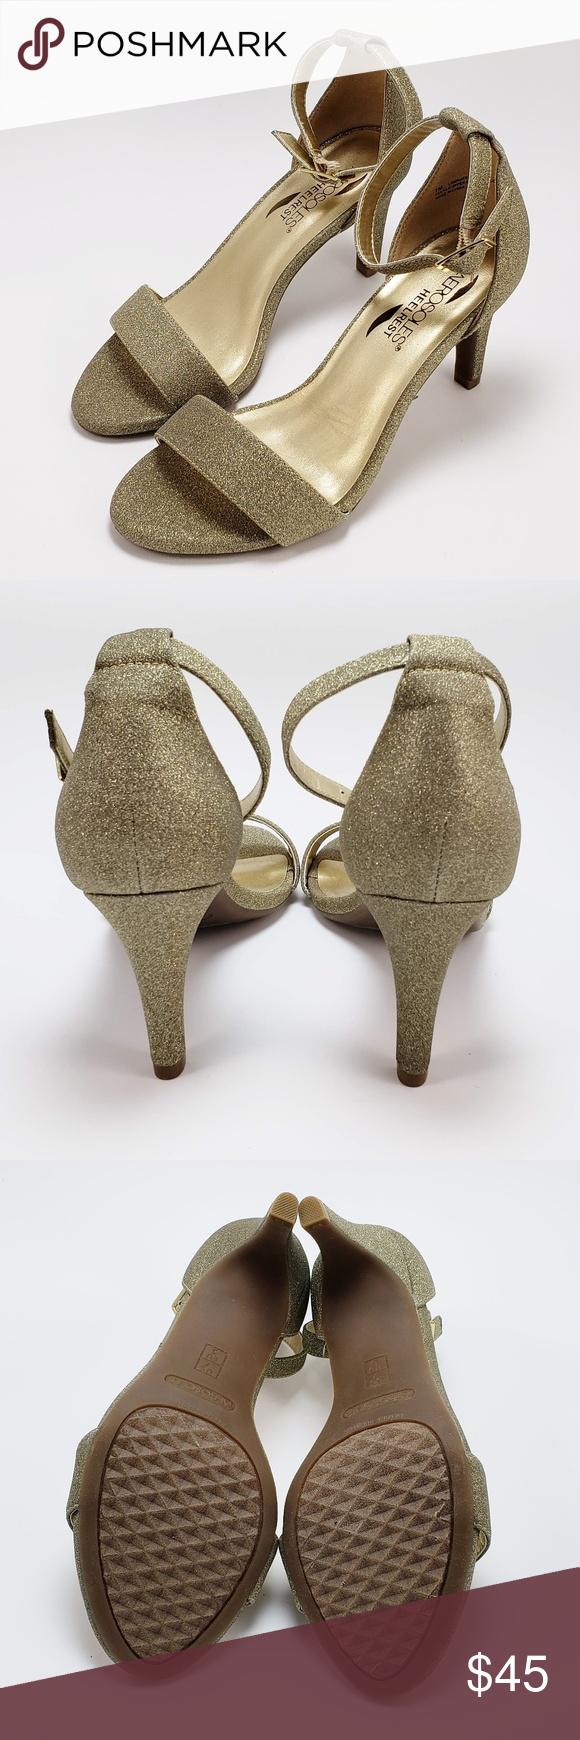 47d59b566435 Aerosoles Laminate Dress Pump Gold - 7 Aerosoles Laminate Dress Pump    Gently Used   Color  Gold Size  7 Heelrest technology Padded Insole AEROSOLES  Shoes ...